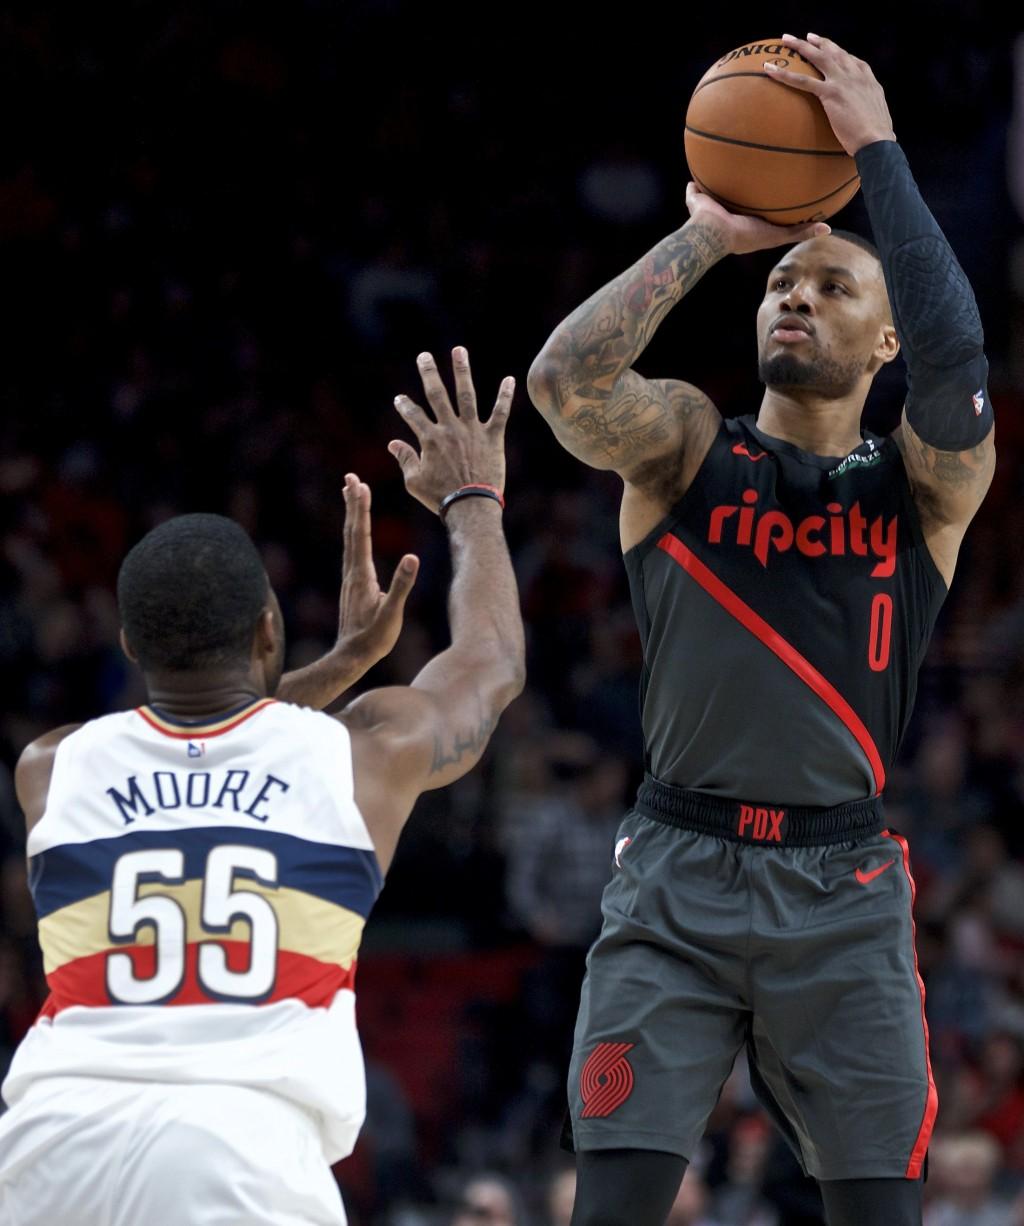 Portland Trail Blazers guard Damian Lillard, right, shoots over New Orleans Pelicans guard E'Twaun Moore during the second half of an NBA basketball g...